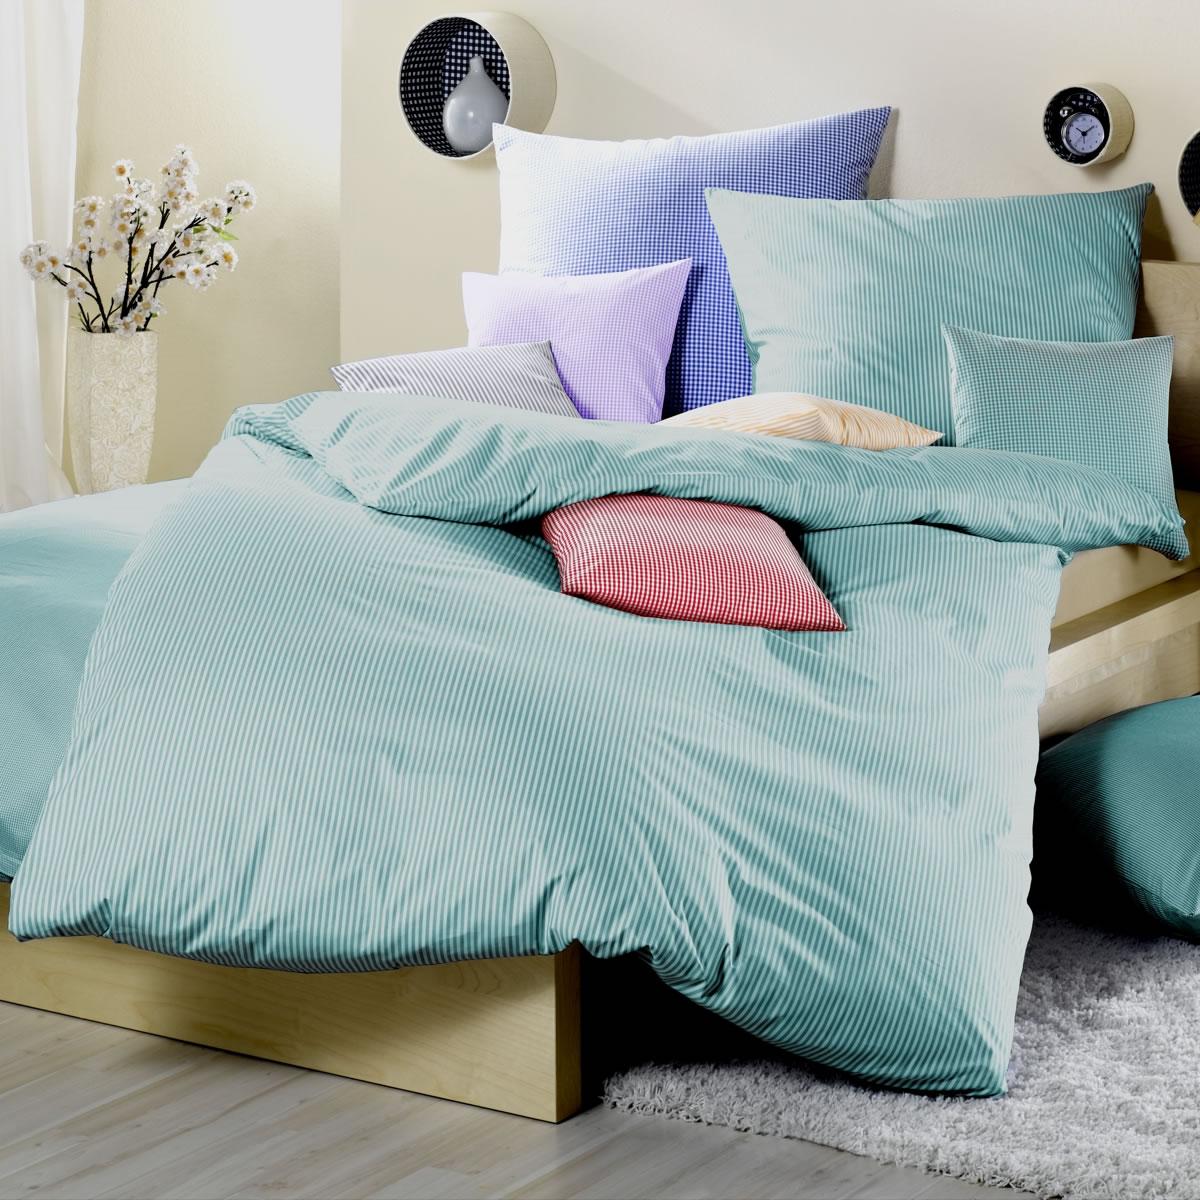 lorena maco batist bettw sche kissenbez ge basel in 026 gr n. Black Bedroom Furniture Sets. Home Design Ideas